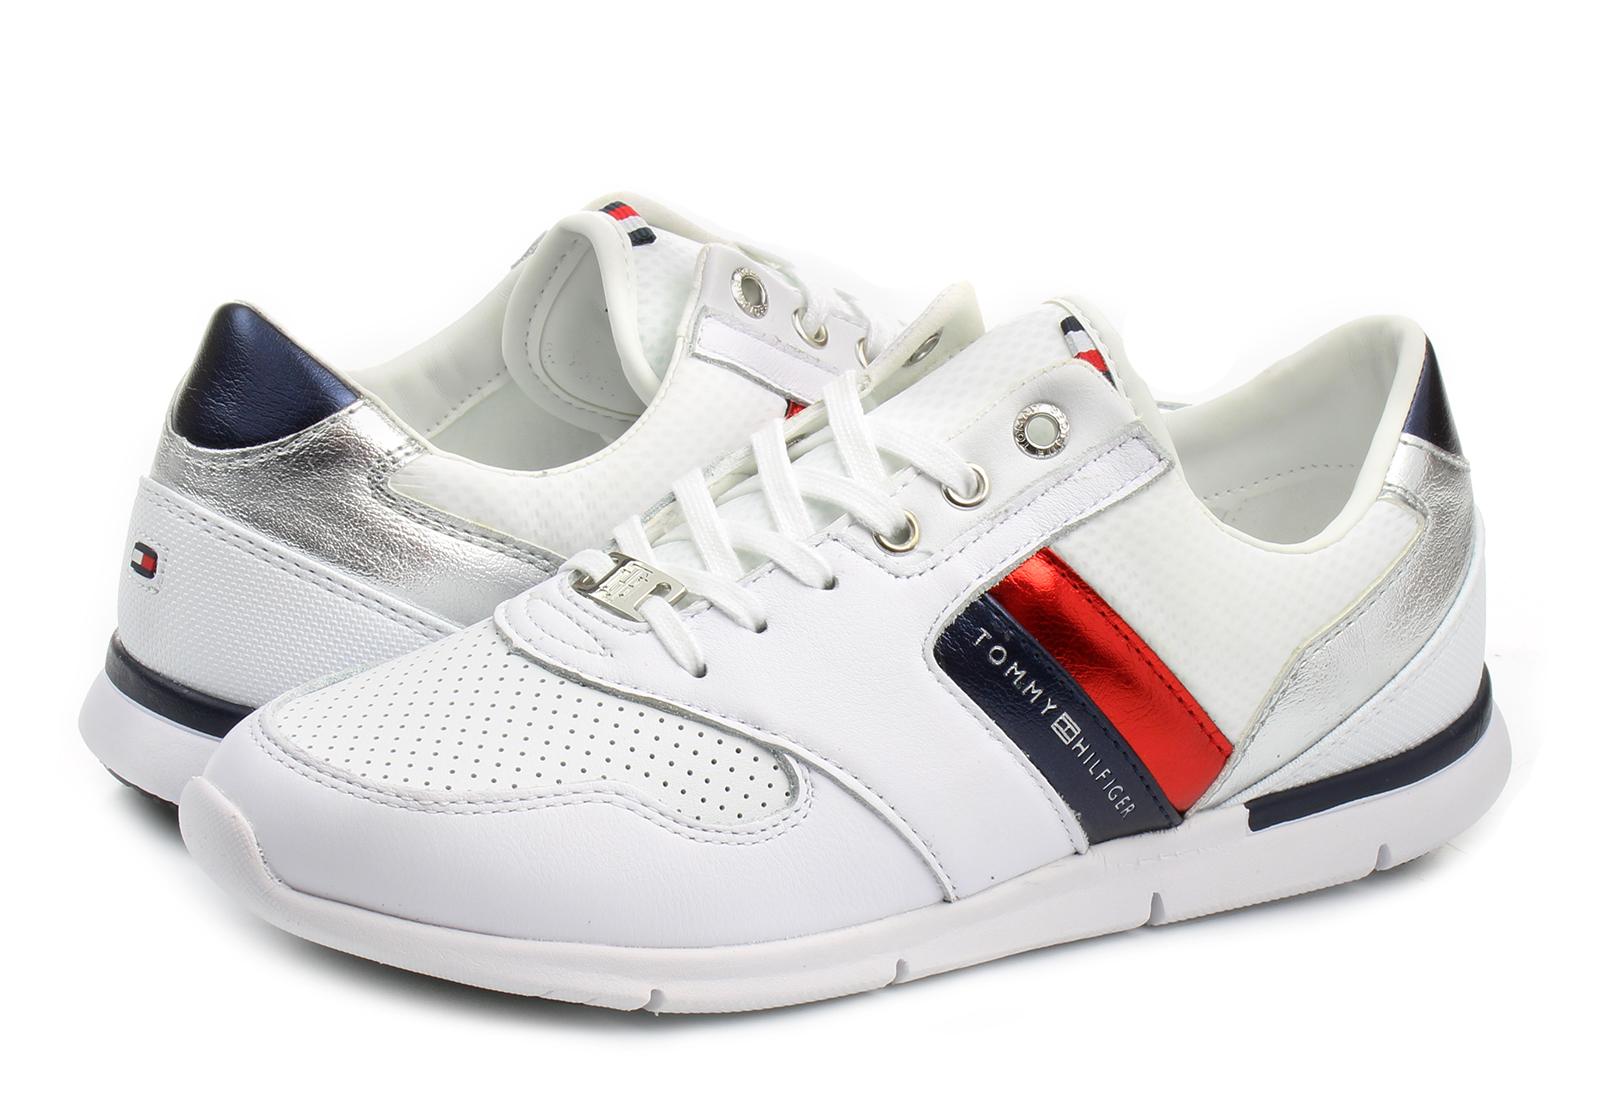 günstig kaufen Neuankömmlinge beste Seite Tommy Hilfiger Shoes - Skye 1 - 18S-2805-020 - Online shop for sneakers,  shoes and boots